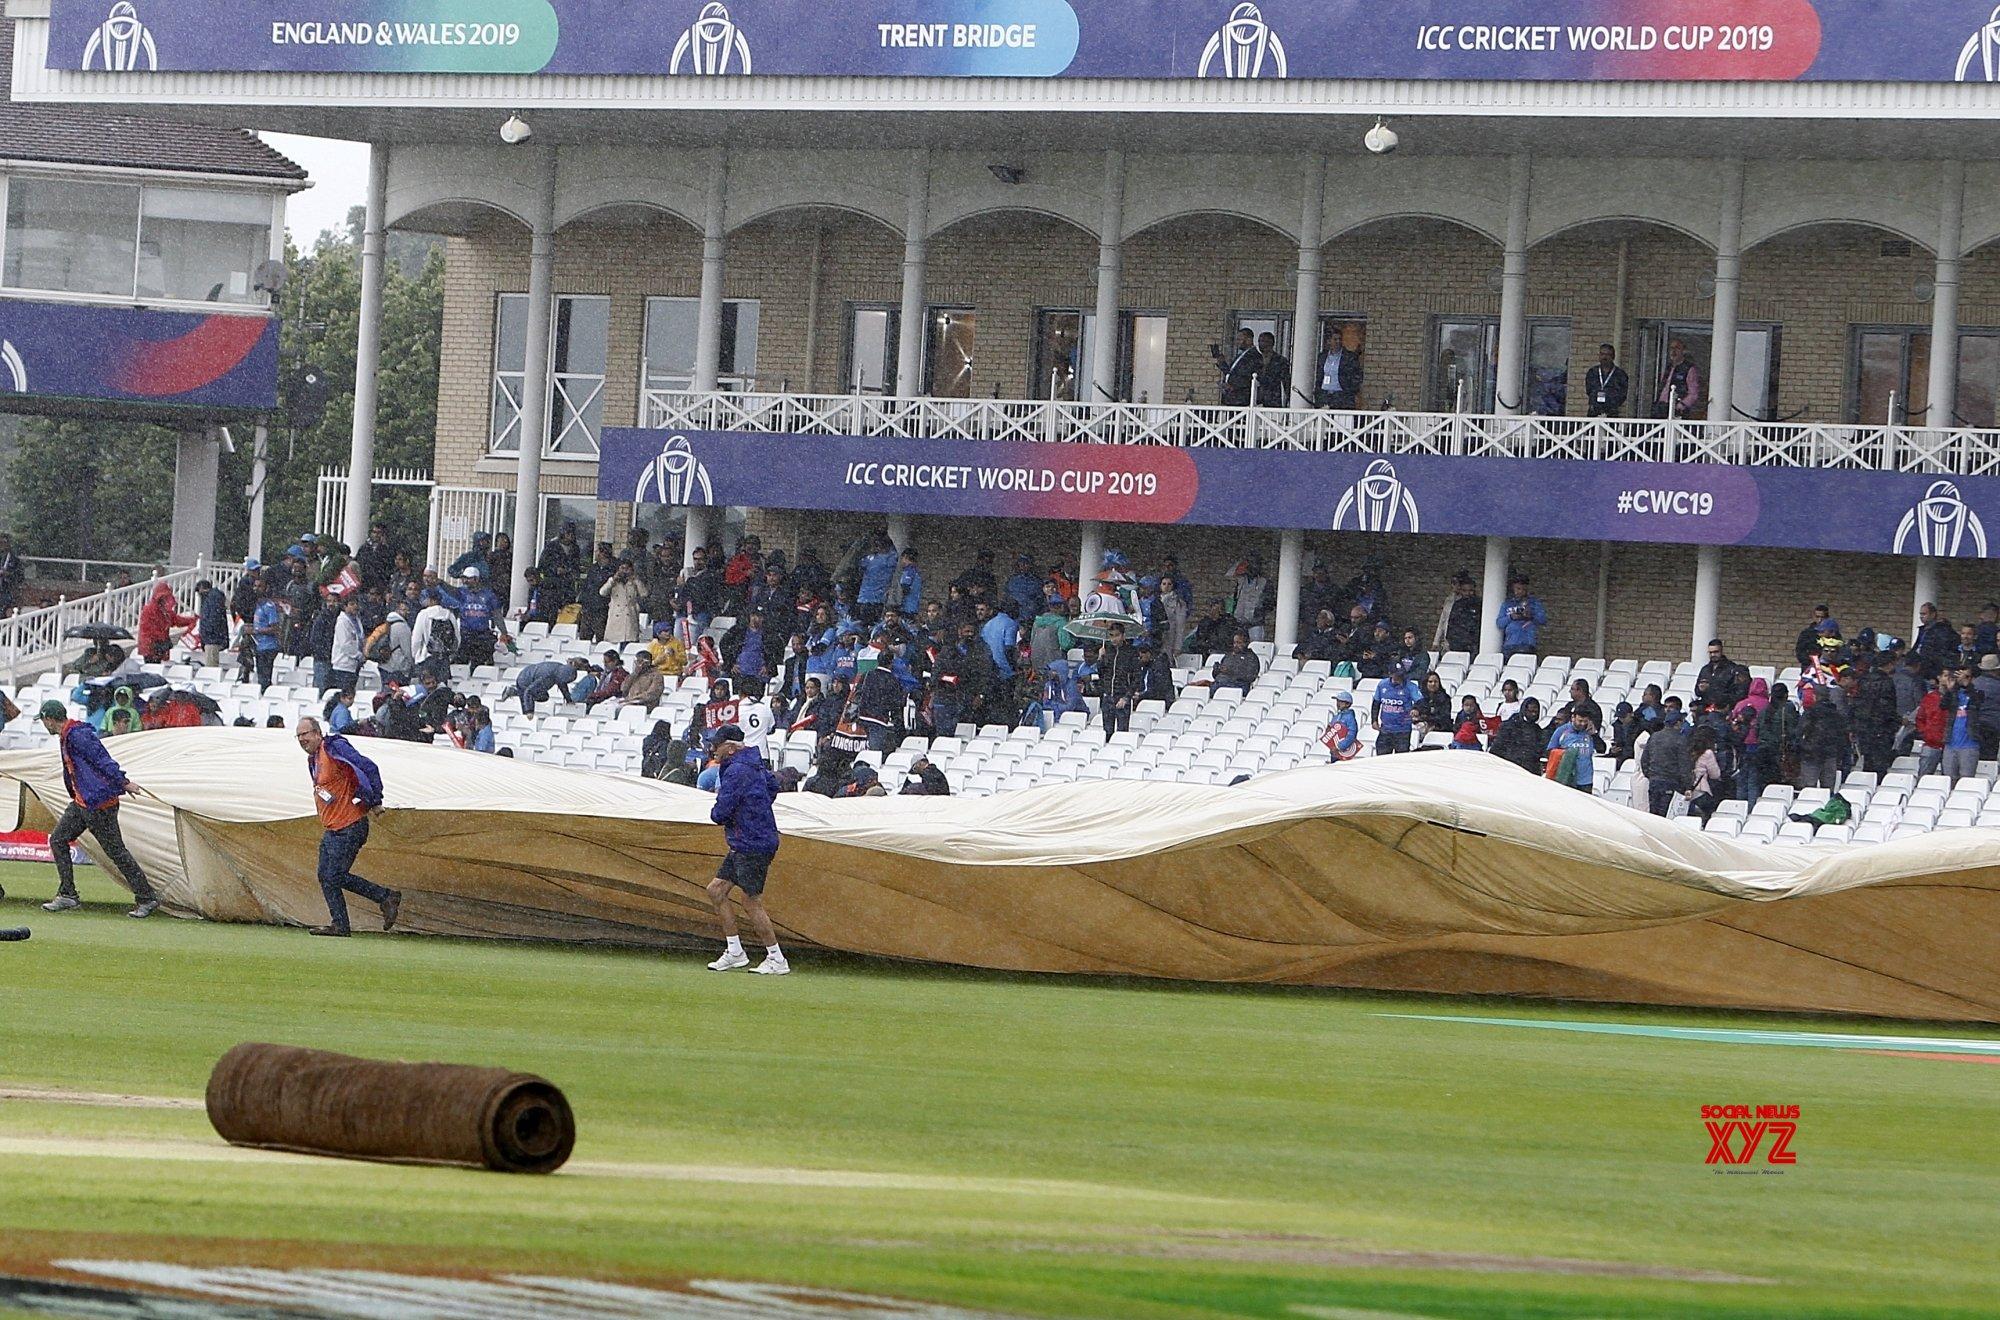 Nottingham (England): World Cup 2019 - Match 18 - India Vs New Zealand (Batch - 1) #Gallery